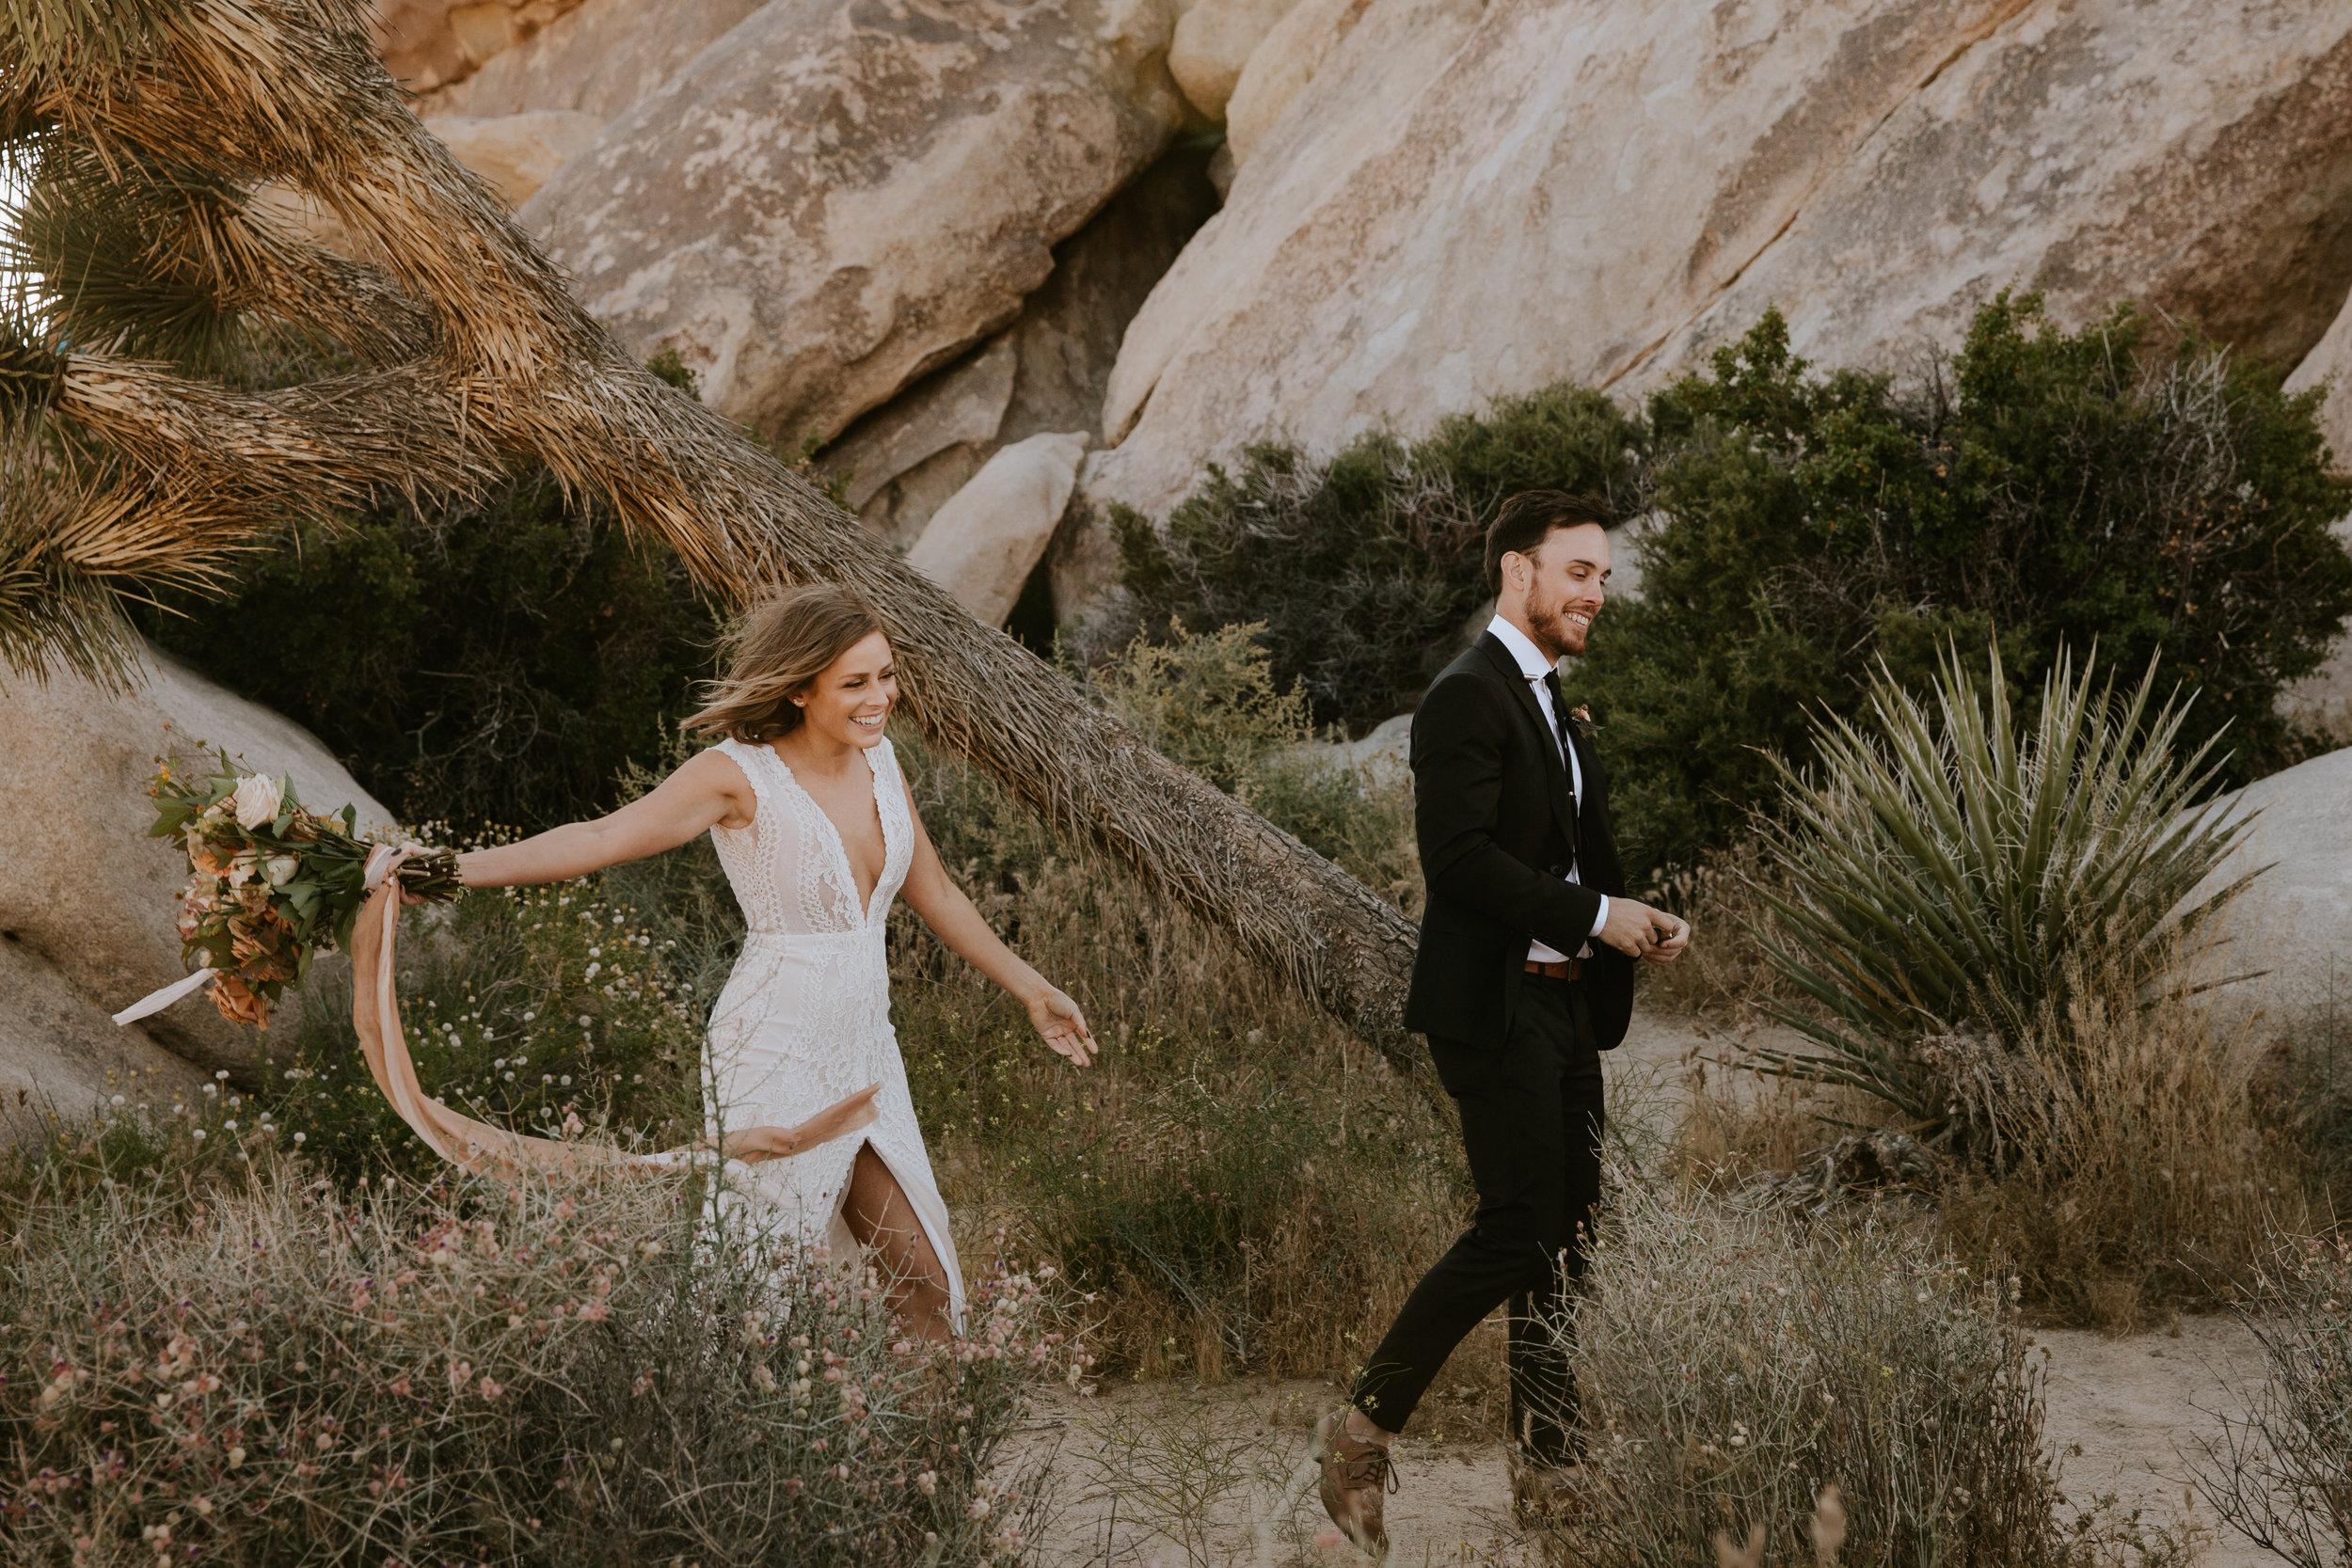 2019-05-26_Callie-Evan_Wedding_Joshua Tree_Paige Nelson_PREVIEWS HR-35.jpg